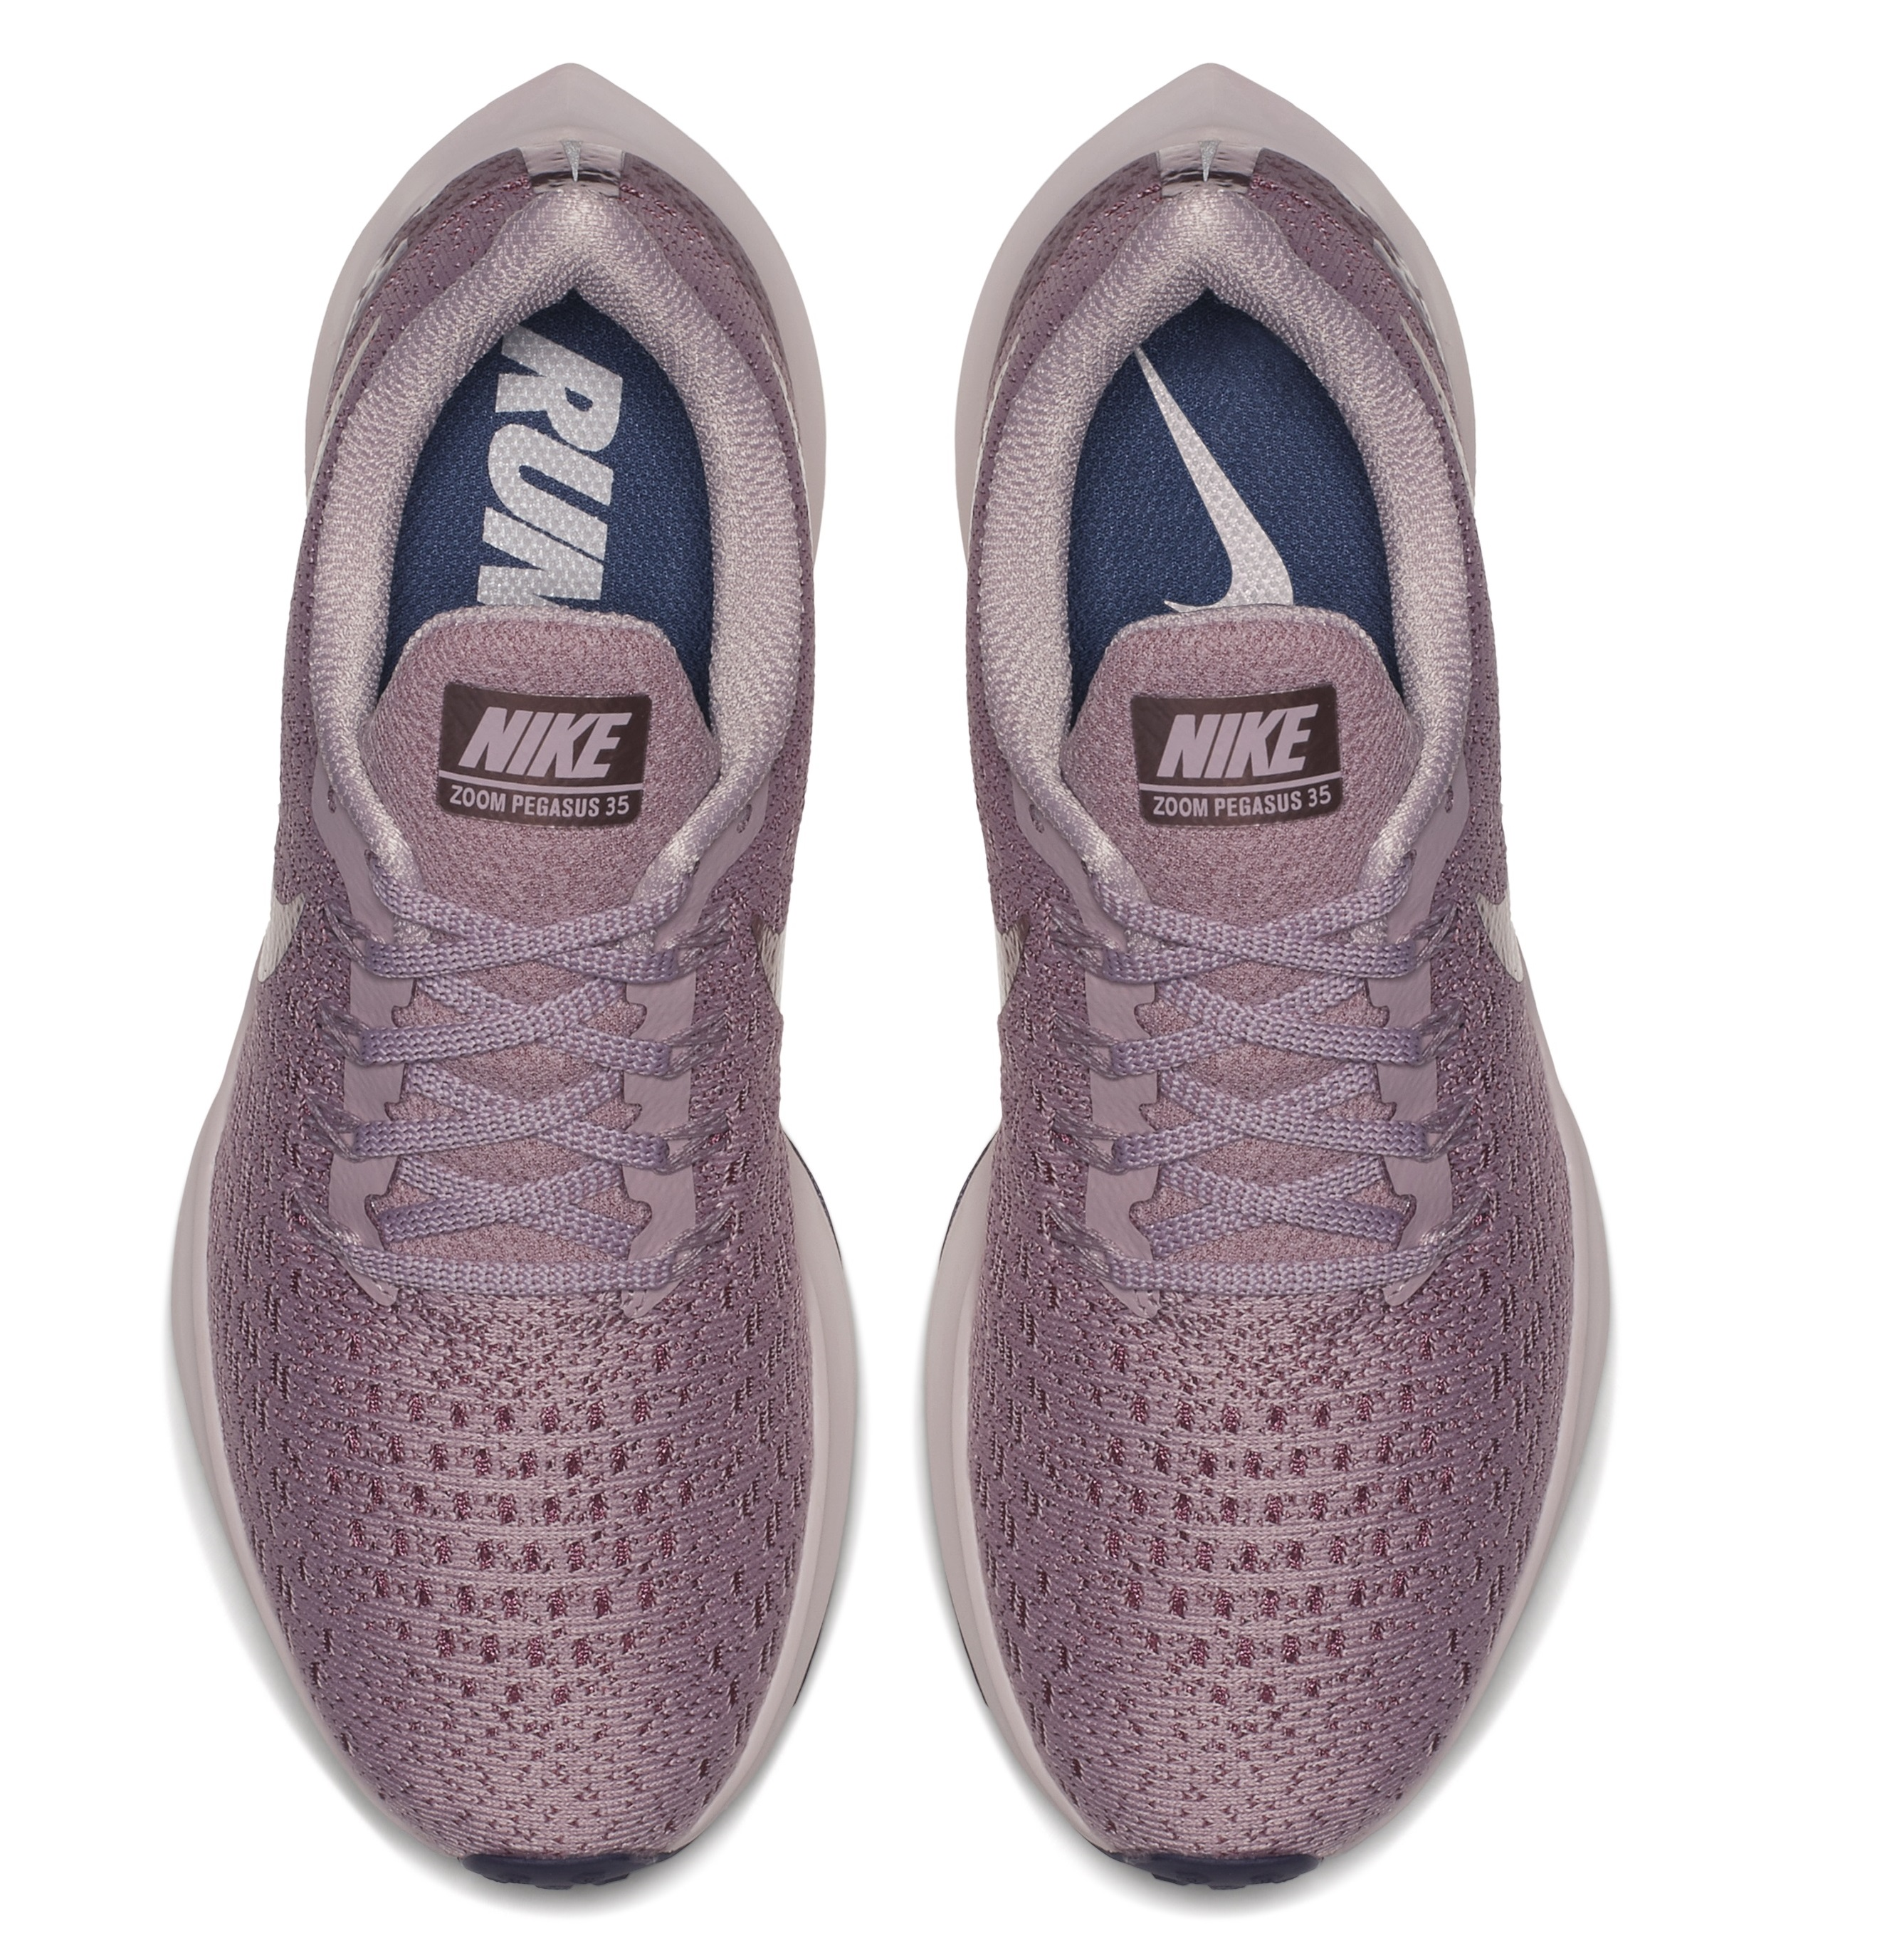 Nike Pegasus 32 Locos Por Correr 02